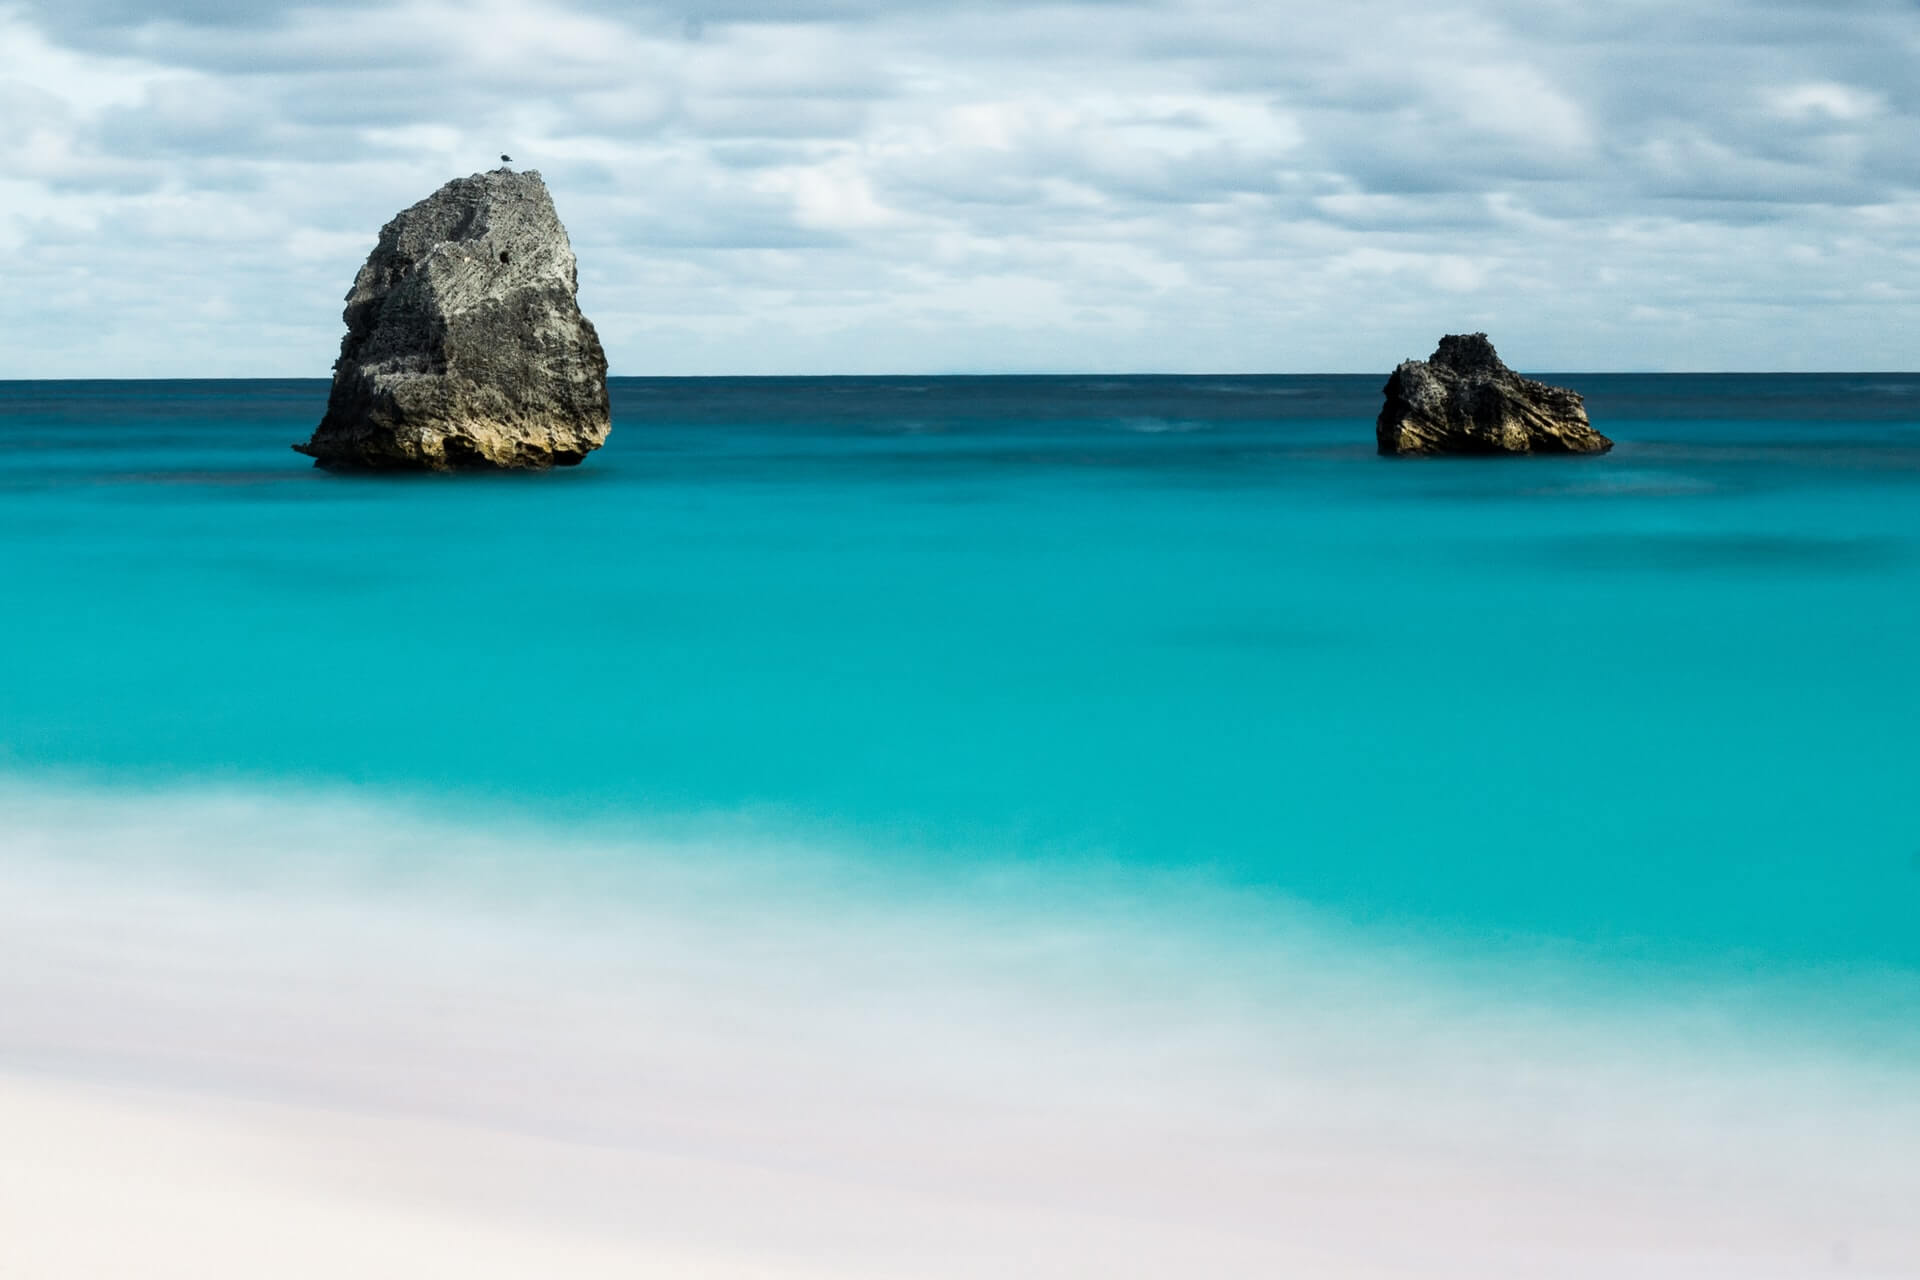 bermuda-image.jpg